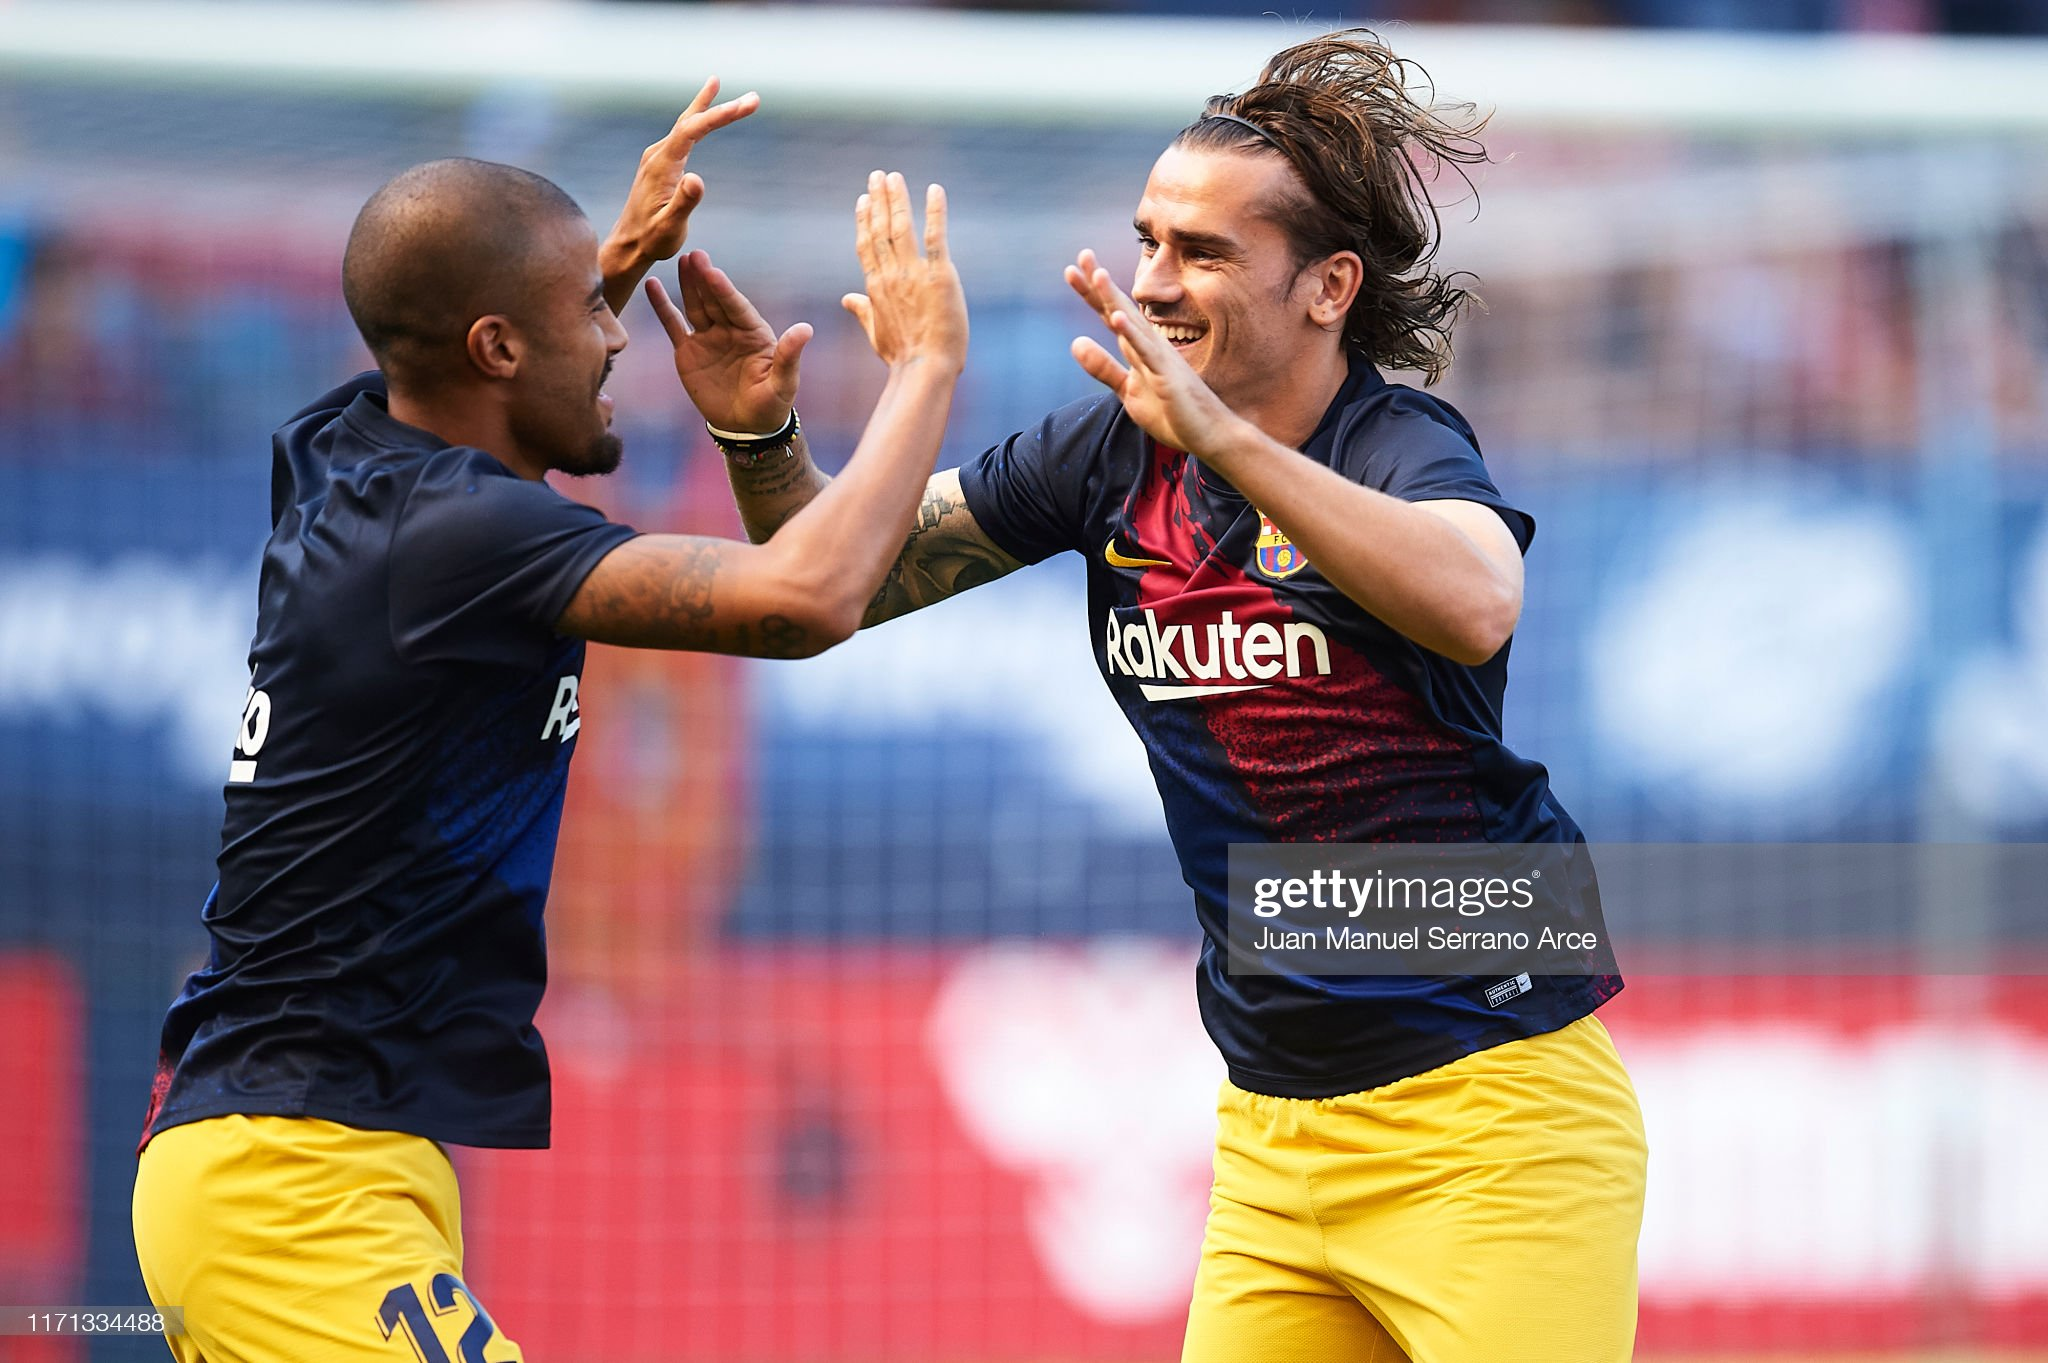 صور مباراة : أوساسونا - برشلونة 2-2 ( 31-08-2019 )  Antoine-griezmann-of-fc-barcelona-and-rafinha-alcantara-of-fc-laugh-picture-id1171334488?s=2048x2048